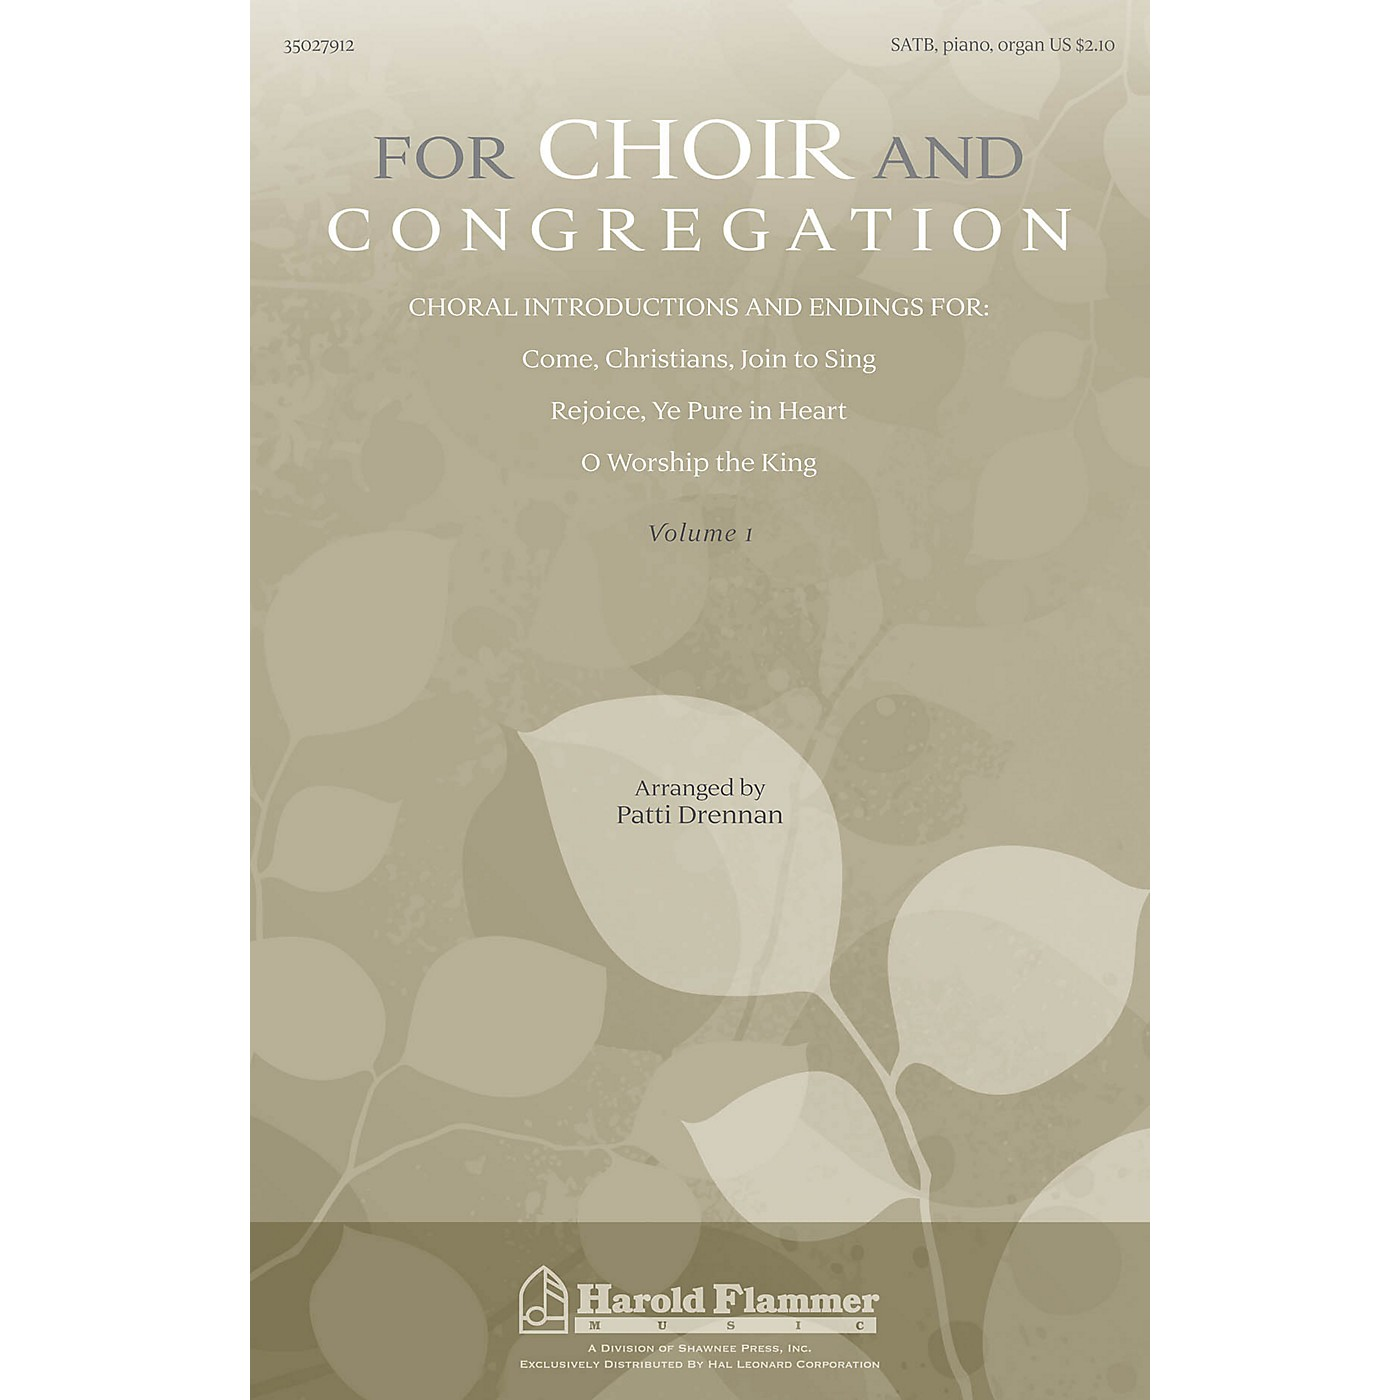 Shawnee Press For Choir and Congregation, Volume 1 SATB, PIANO AND ORGAN arranged by Patti Drennan thumbnail